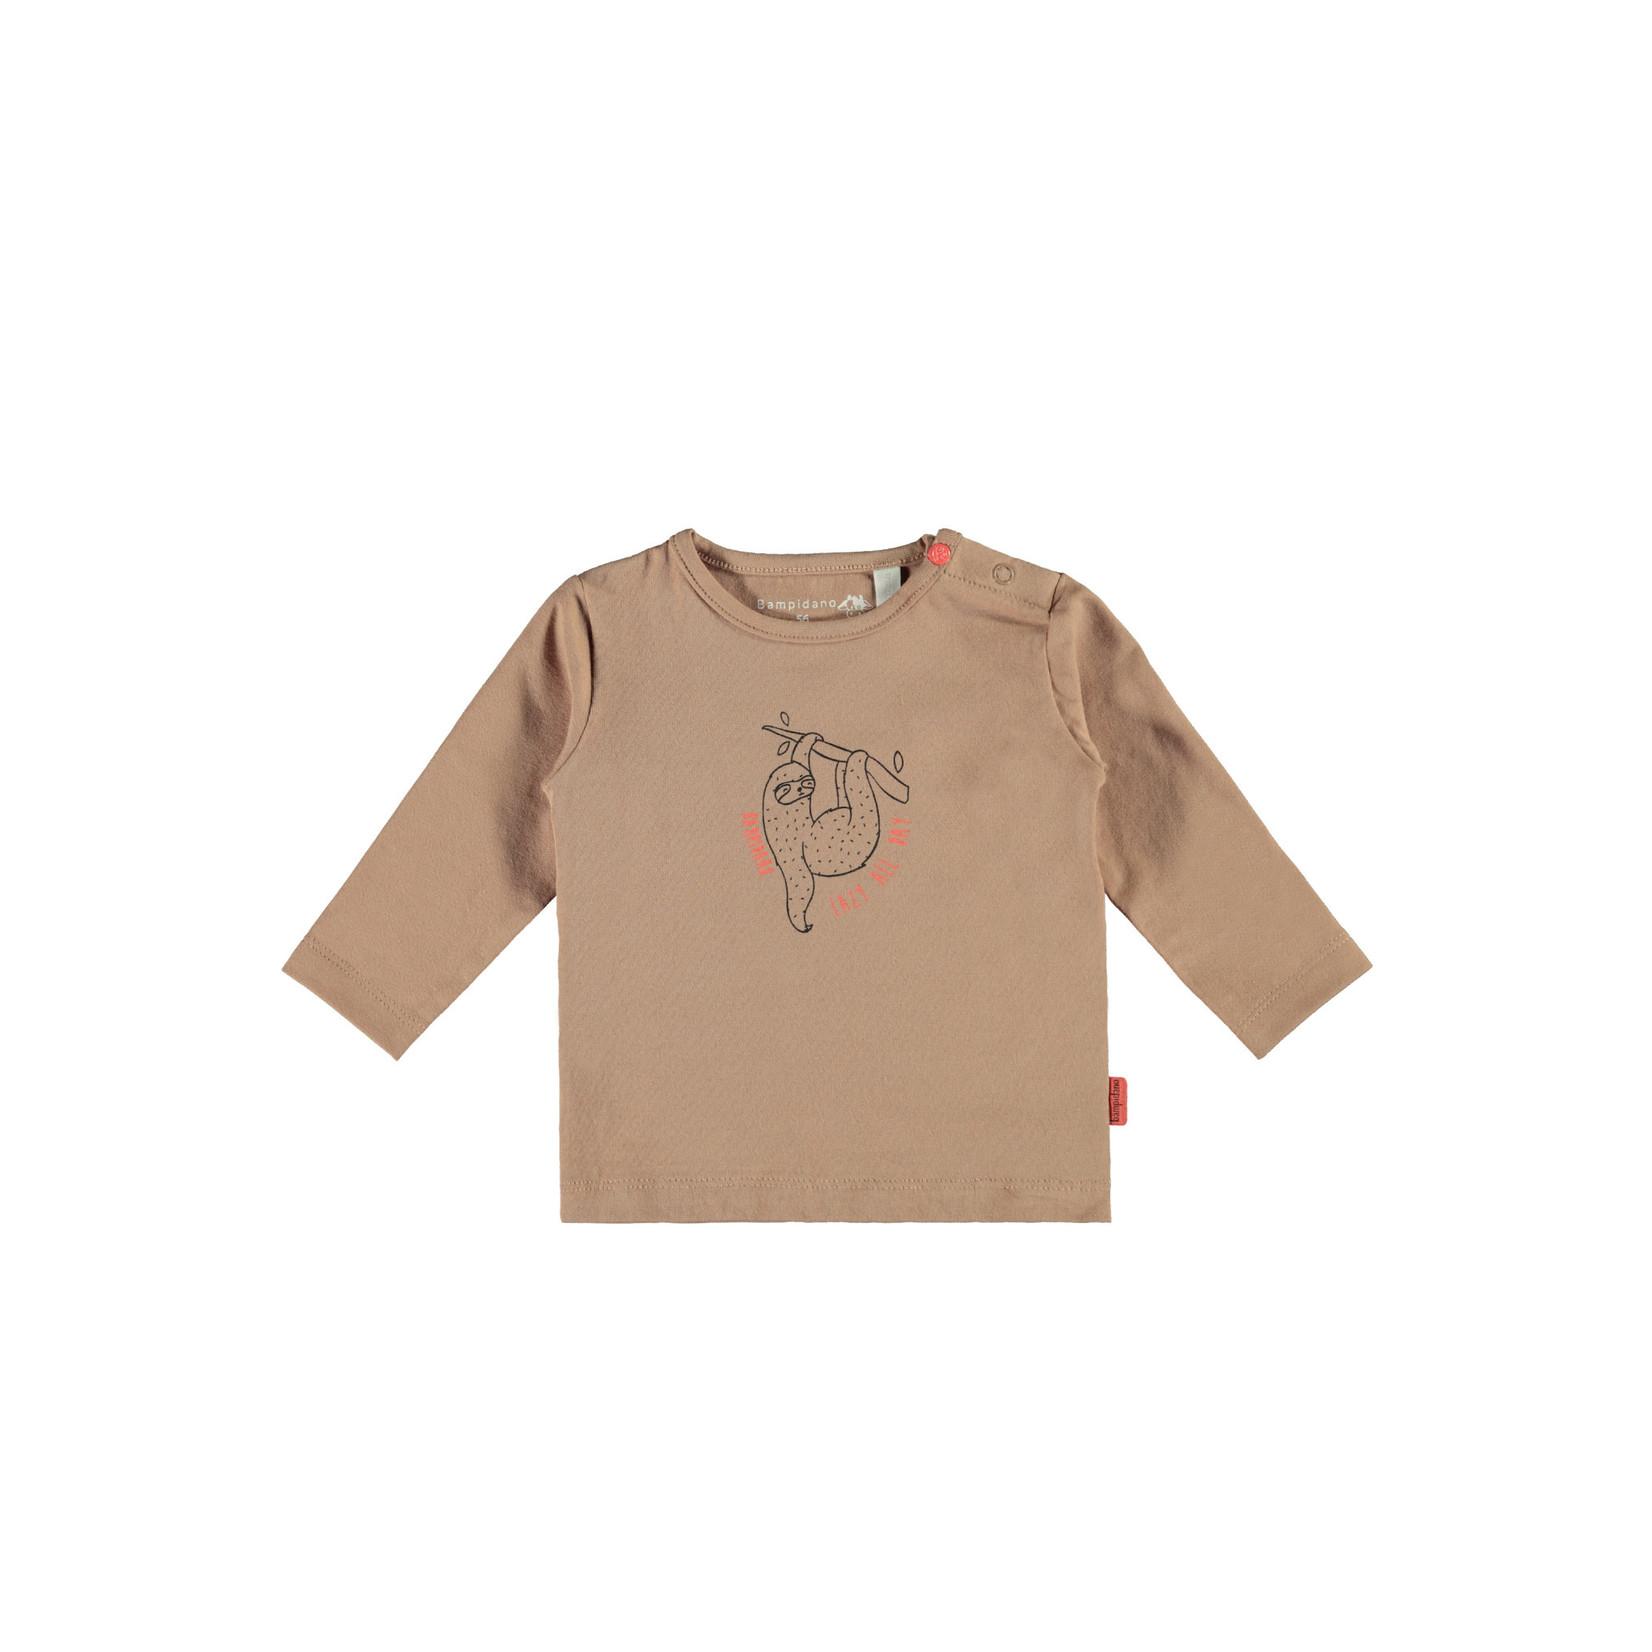 Little Bampidano Little Bampidano newborn longsleeve Fynn plain with print SLOTH